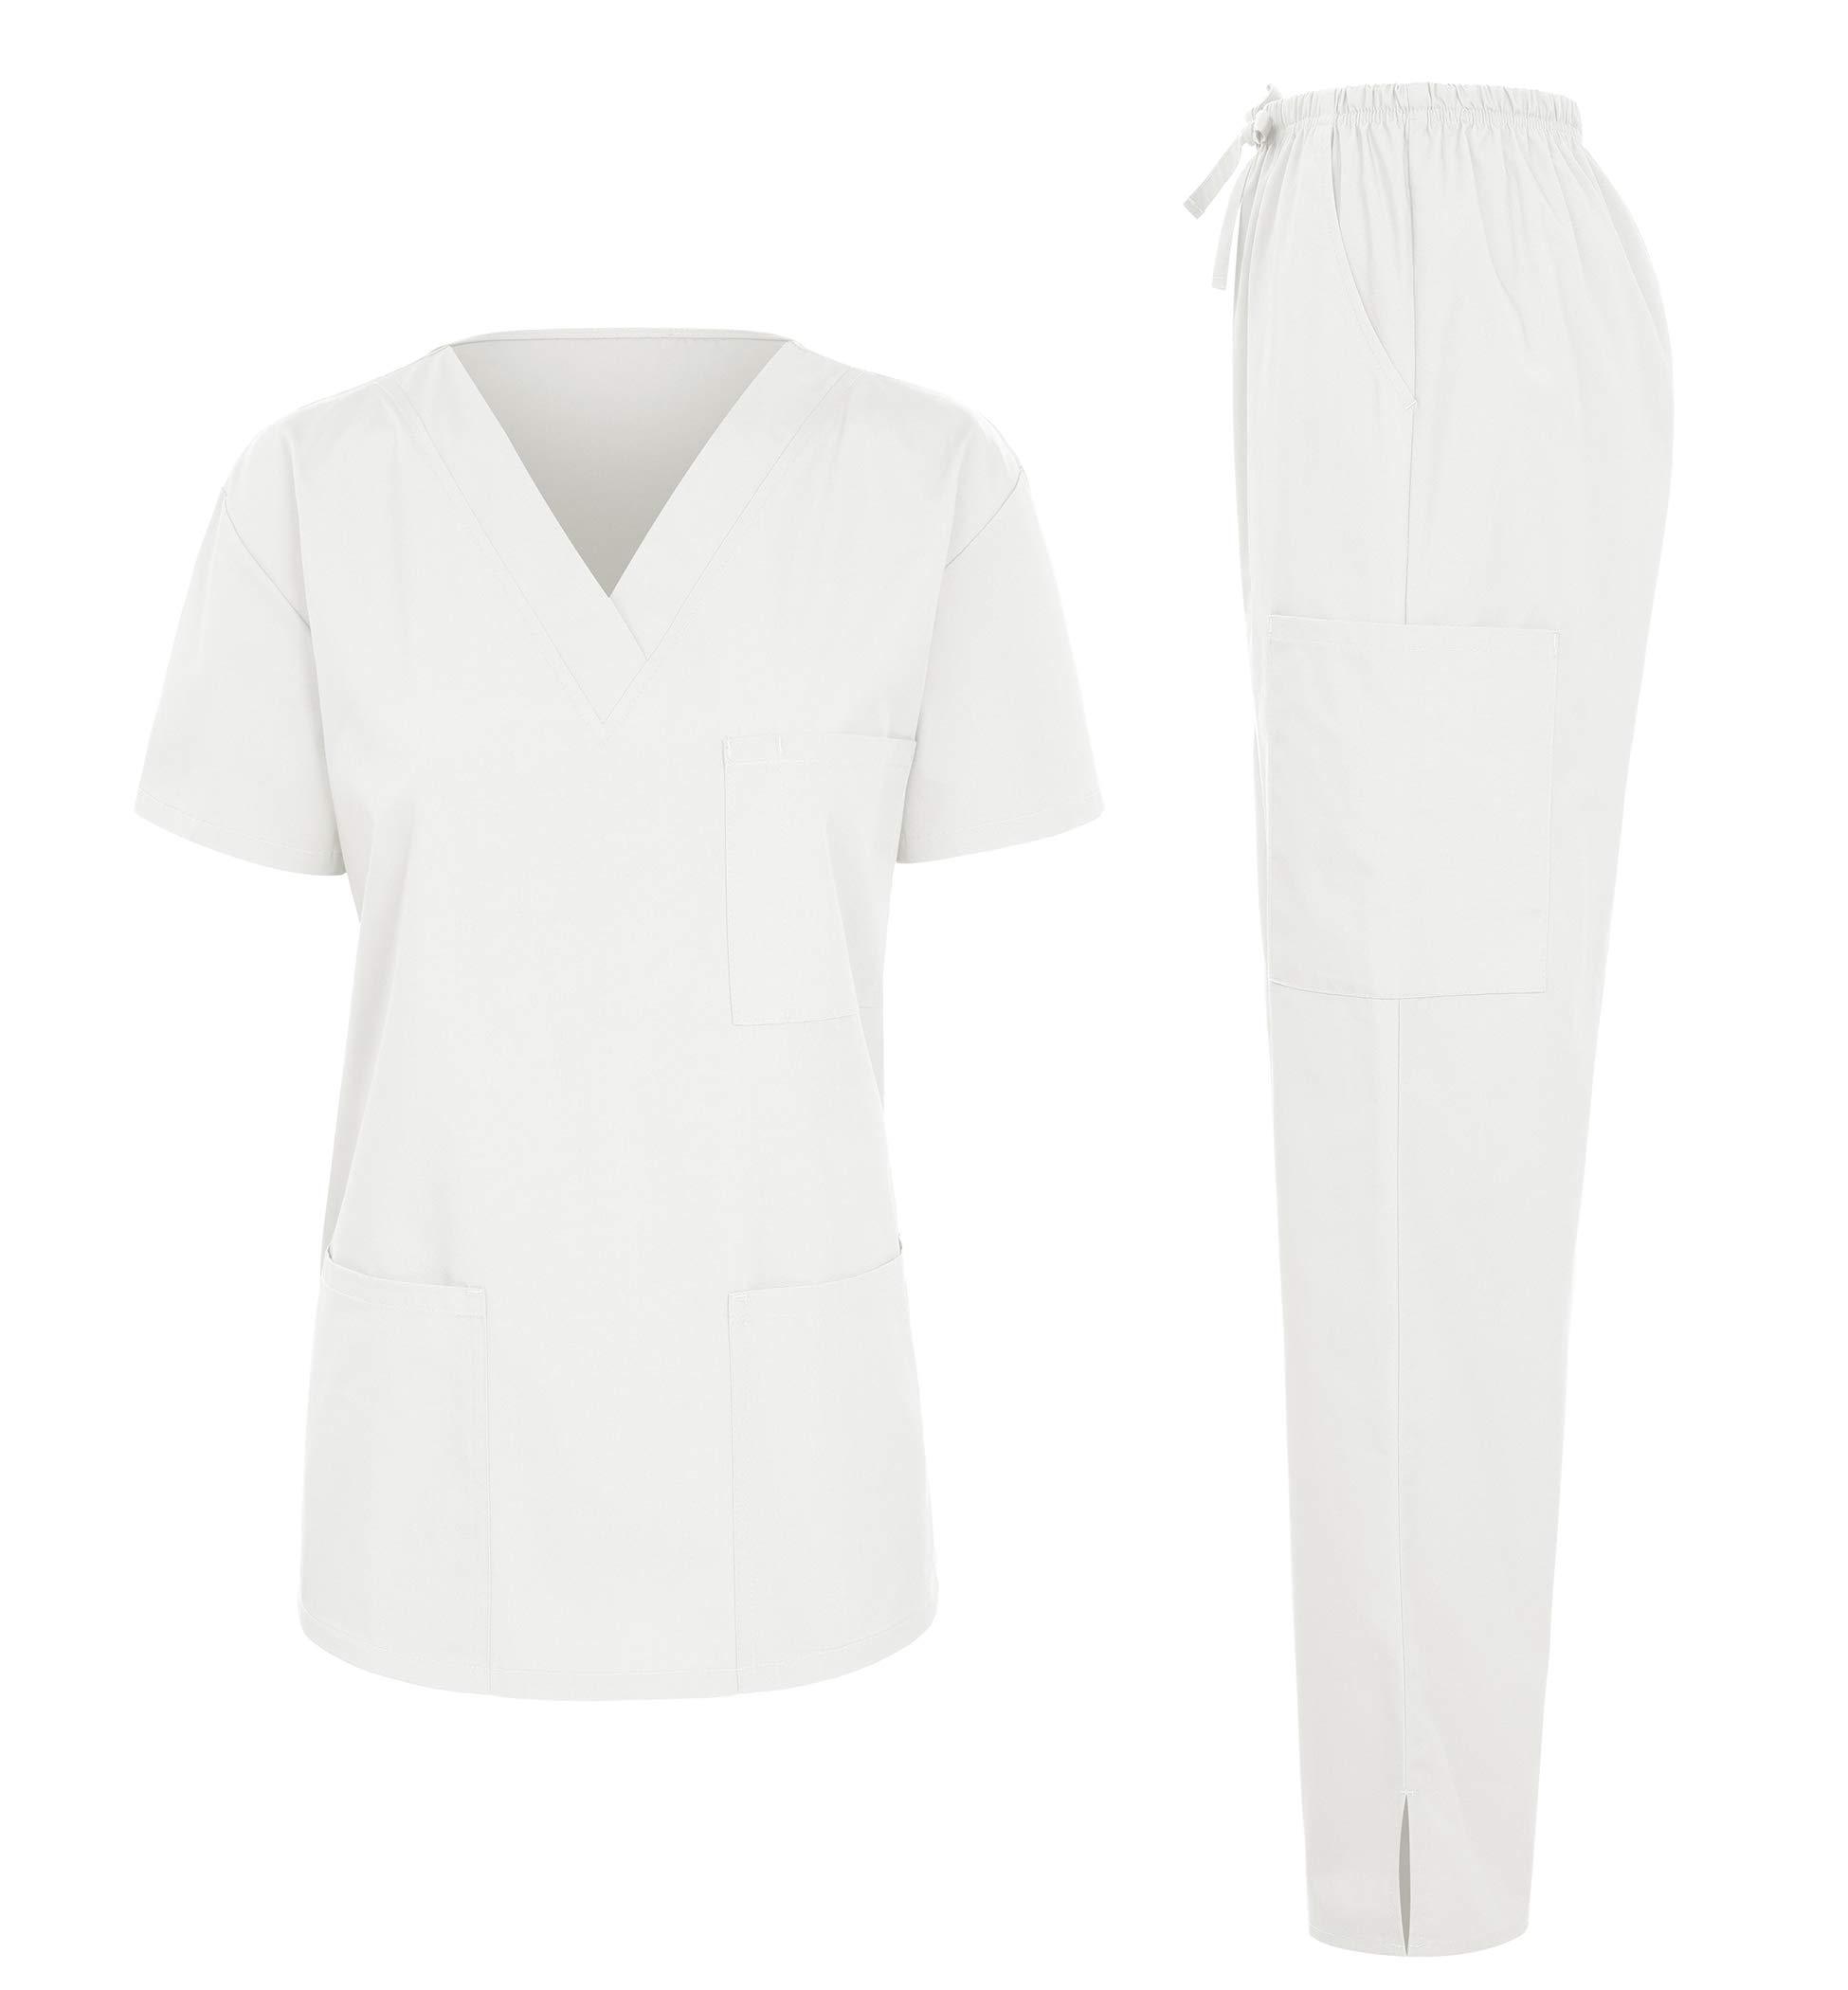 7047 Women's Medical Scrubs Set (V-Neck Top+Drawstring Pant) White XSmall